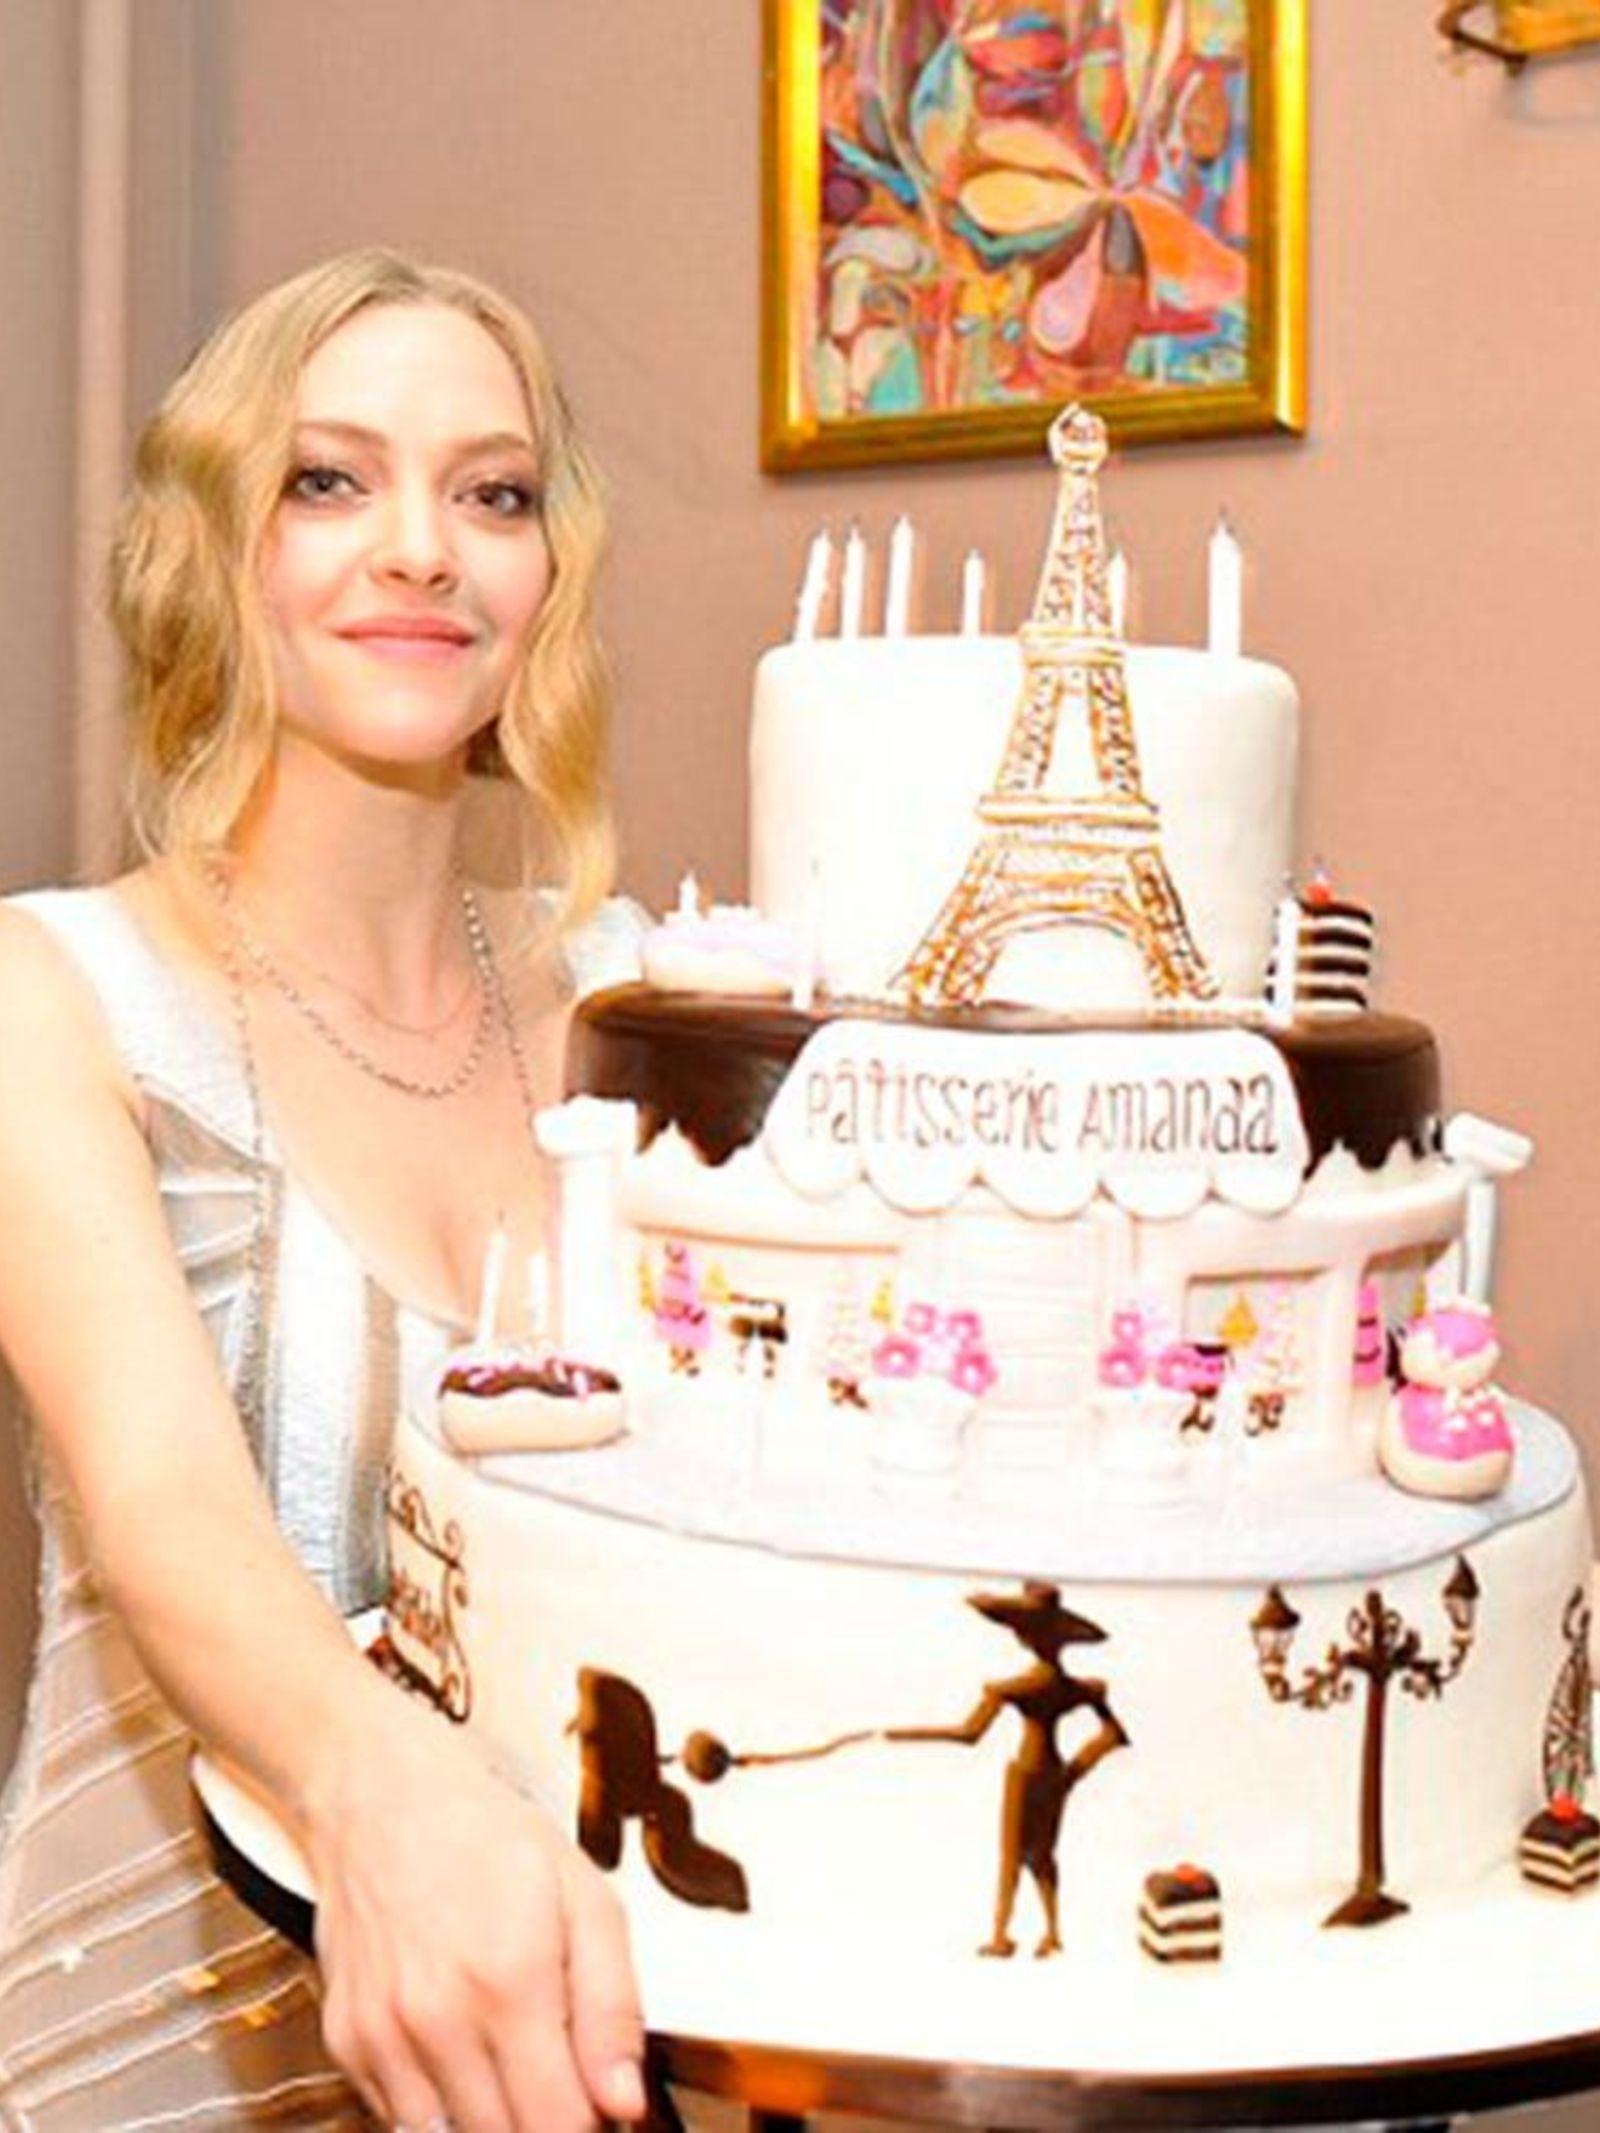 Tremendous The Best Ever Celebrity Birthday Cakes Big Birthday Cake Funny Birthday Cards Online Aeocydamsfinfo